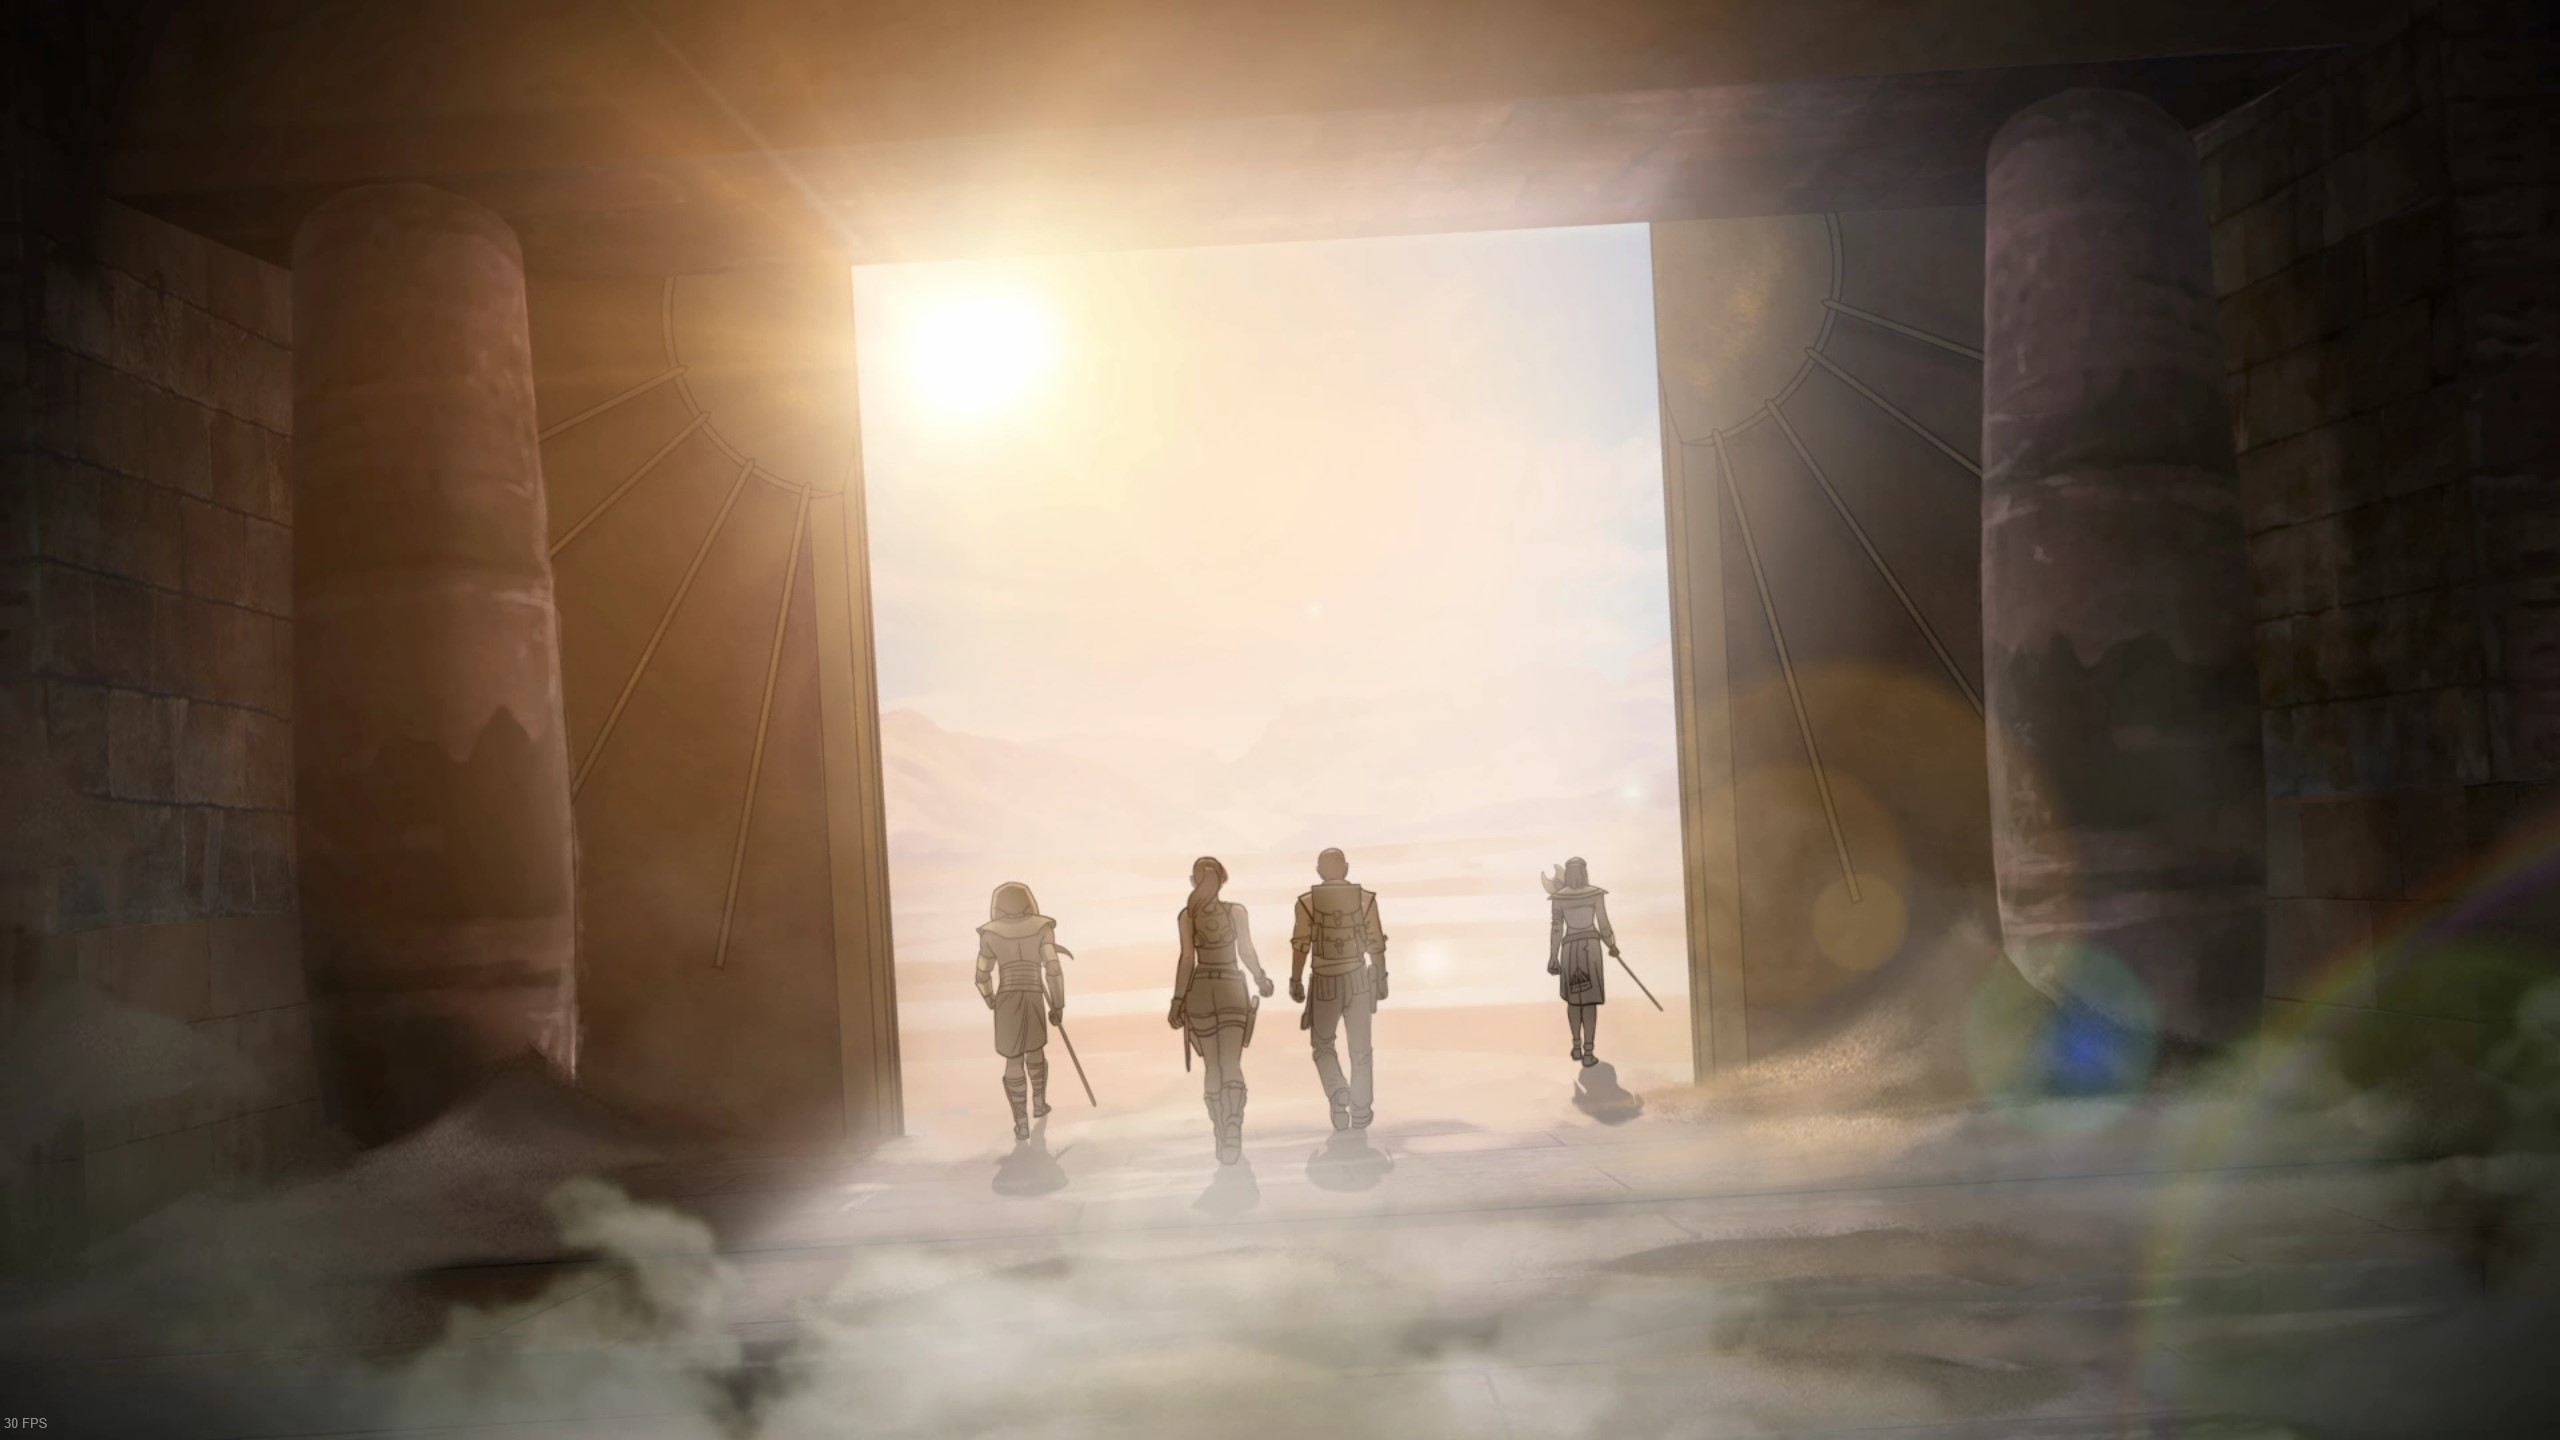 劳拉和奥西里斯神庙 Lara Croft and The Temple of Osiris